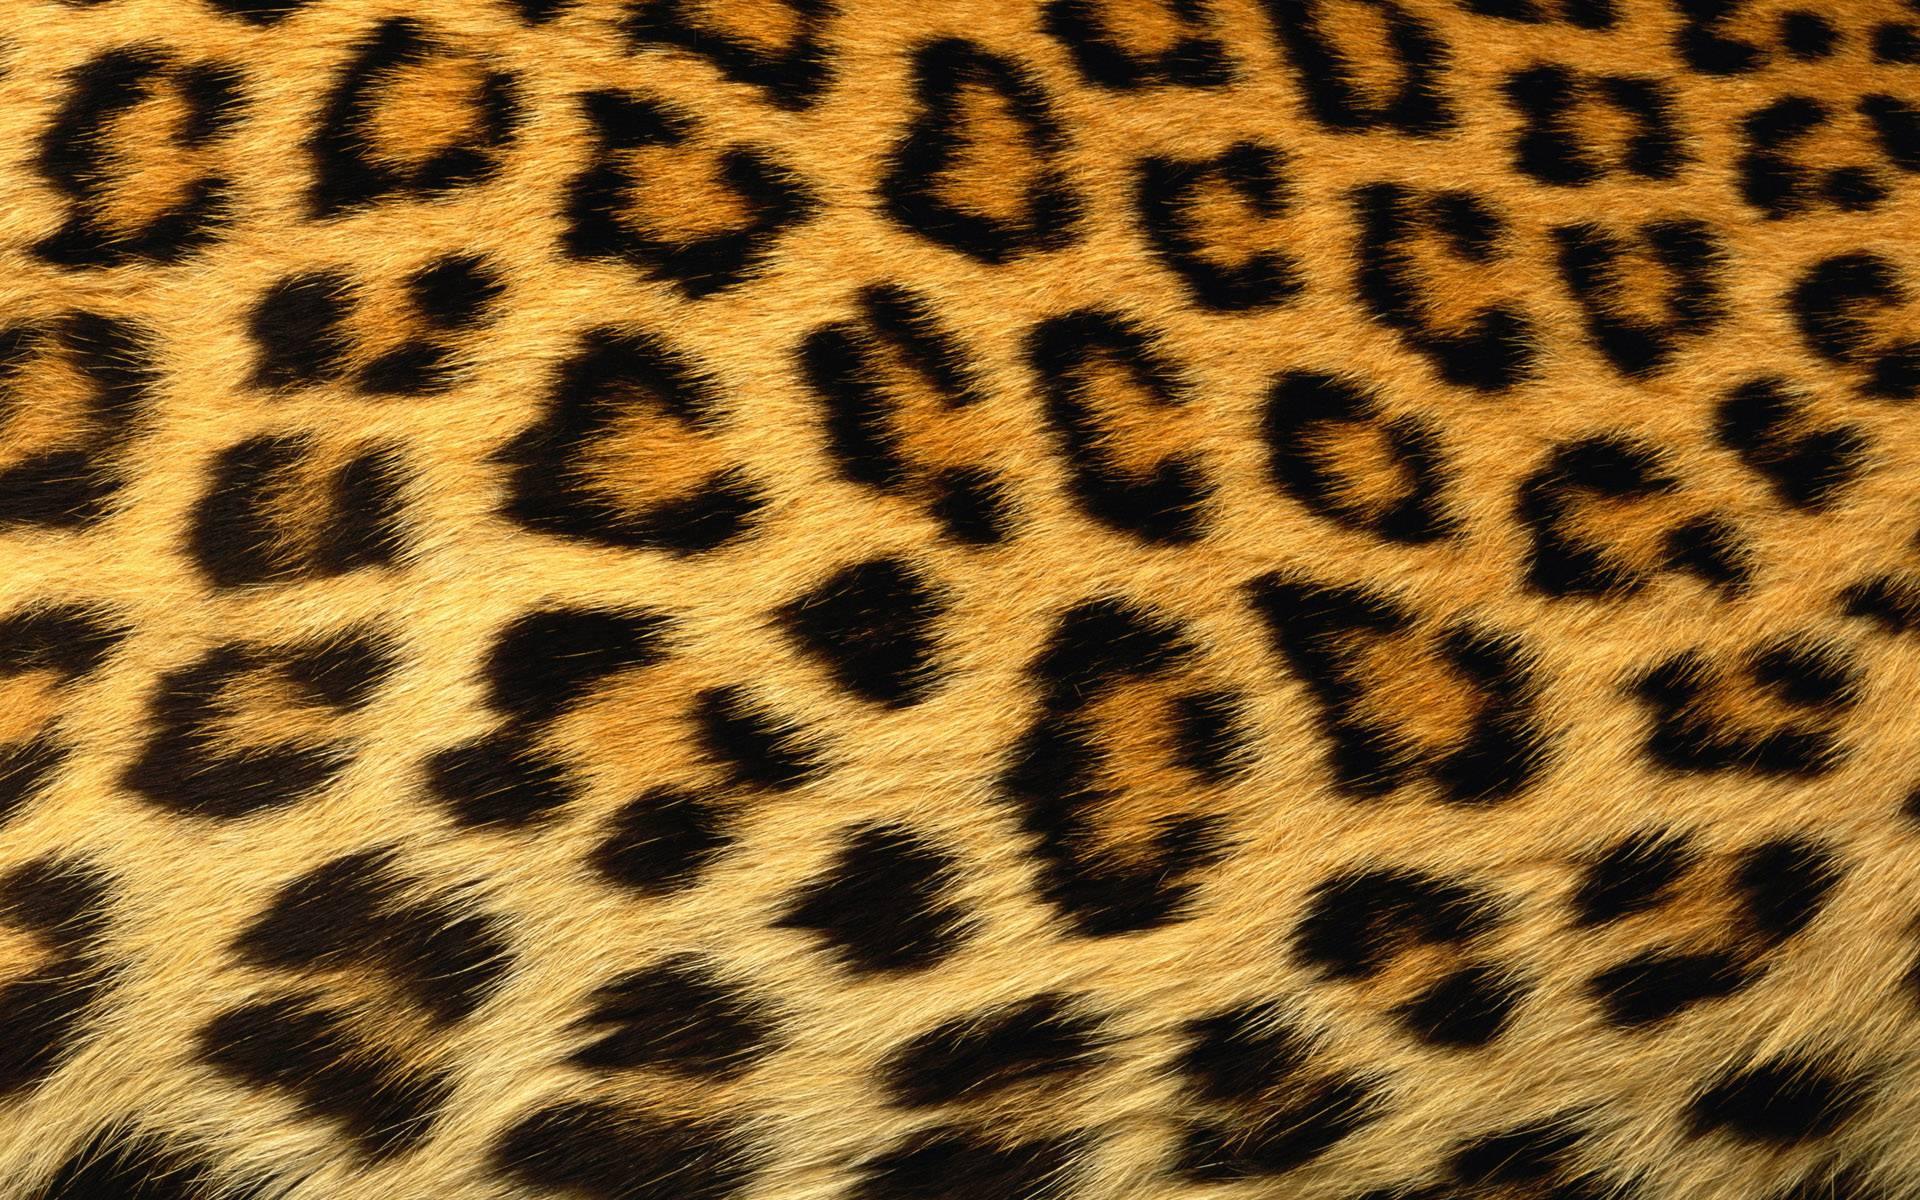 Wallpaper download free image search hd - Leopard Wallpapers Full Hd Wallpaper Search Download